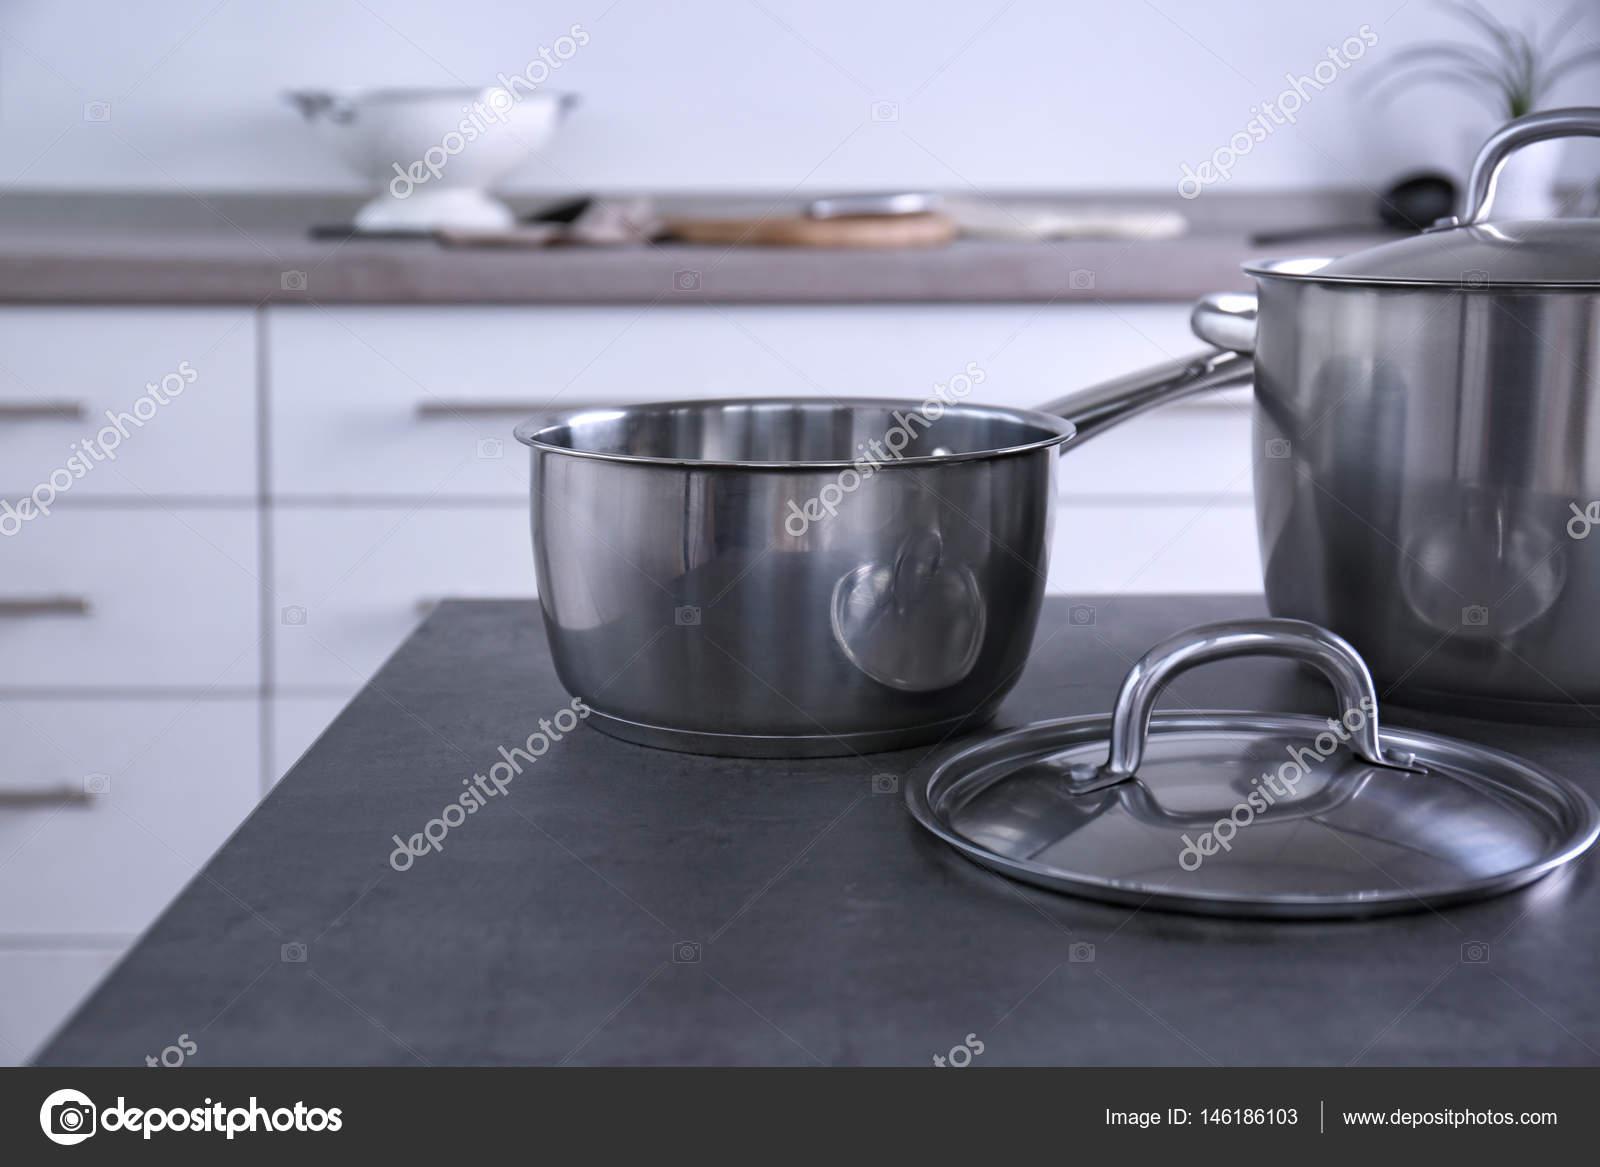 metal kitchen tables black appliance packages 在厨房里的金属锅 图库照片 c belchonock 146186103 在厨房桌子上的金属锅一套 照片作者belchonock